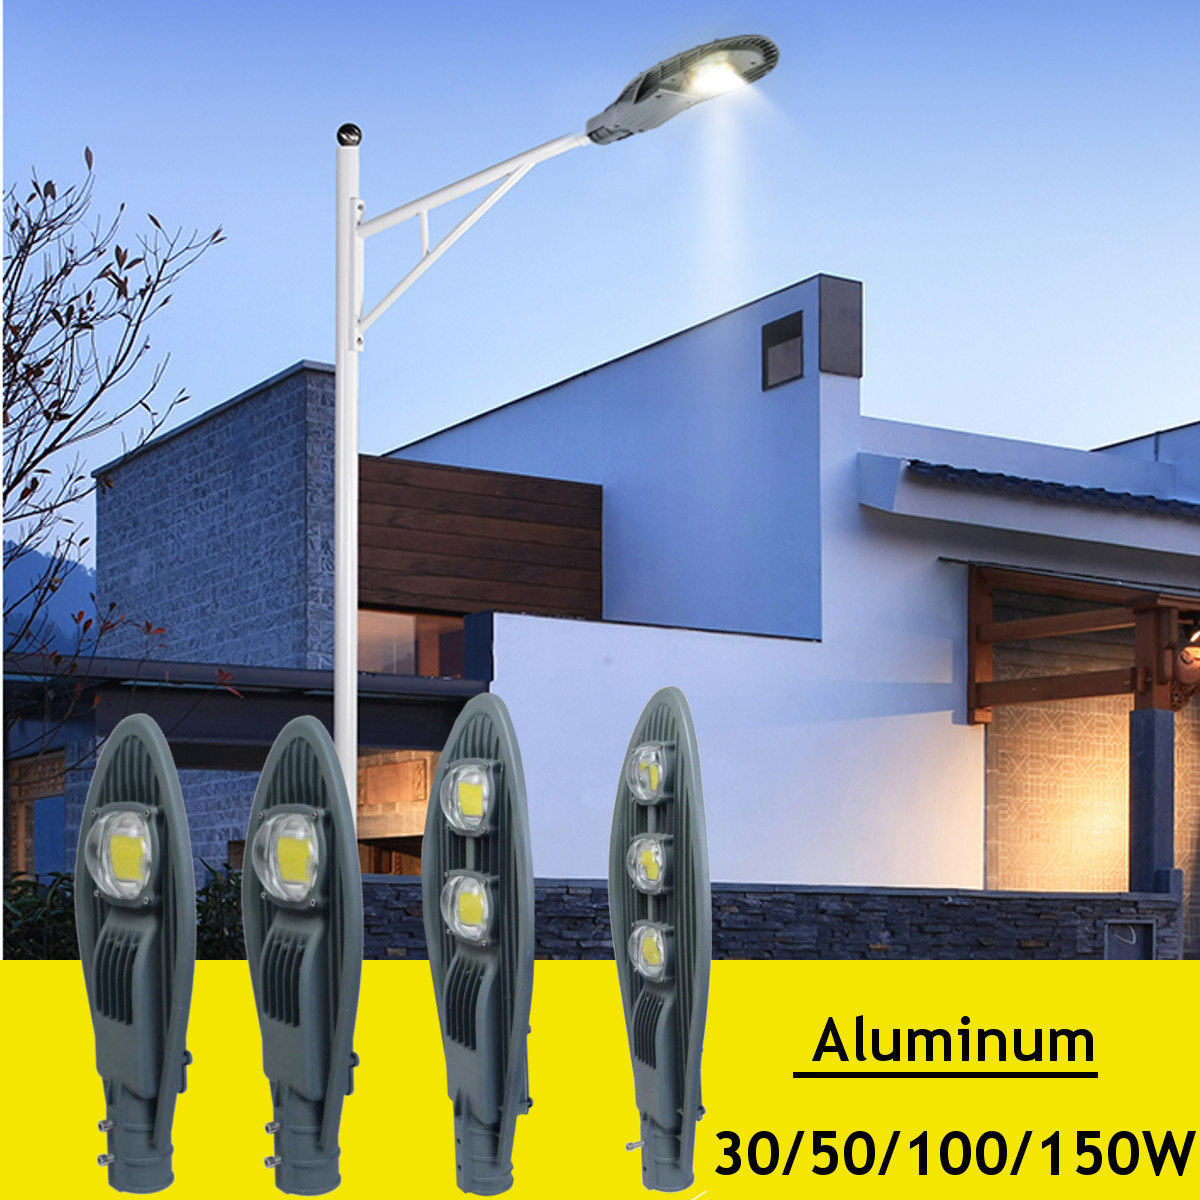 30/50/100W Waterproof LED Street Light Area Parking Lot Yard Barn Outdoor Wall Lamp Industrial Garden Square Highway Road Lamp